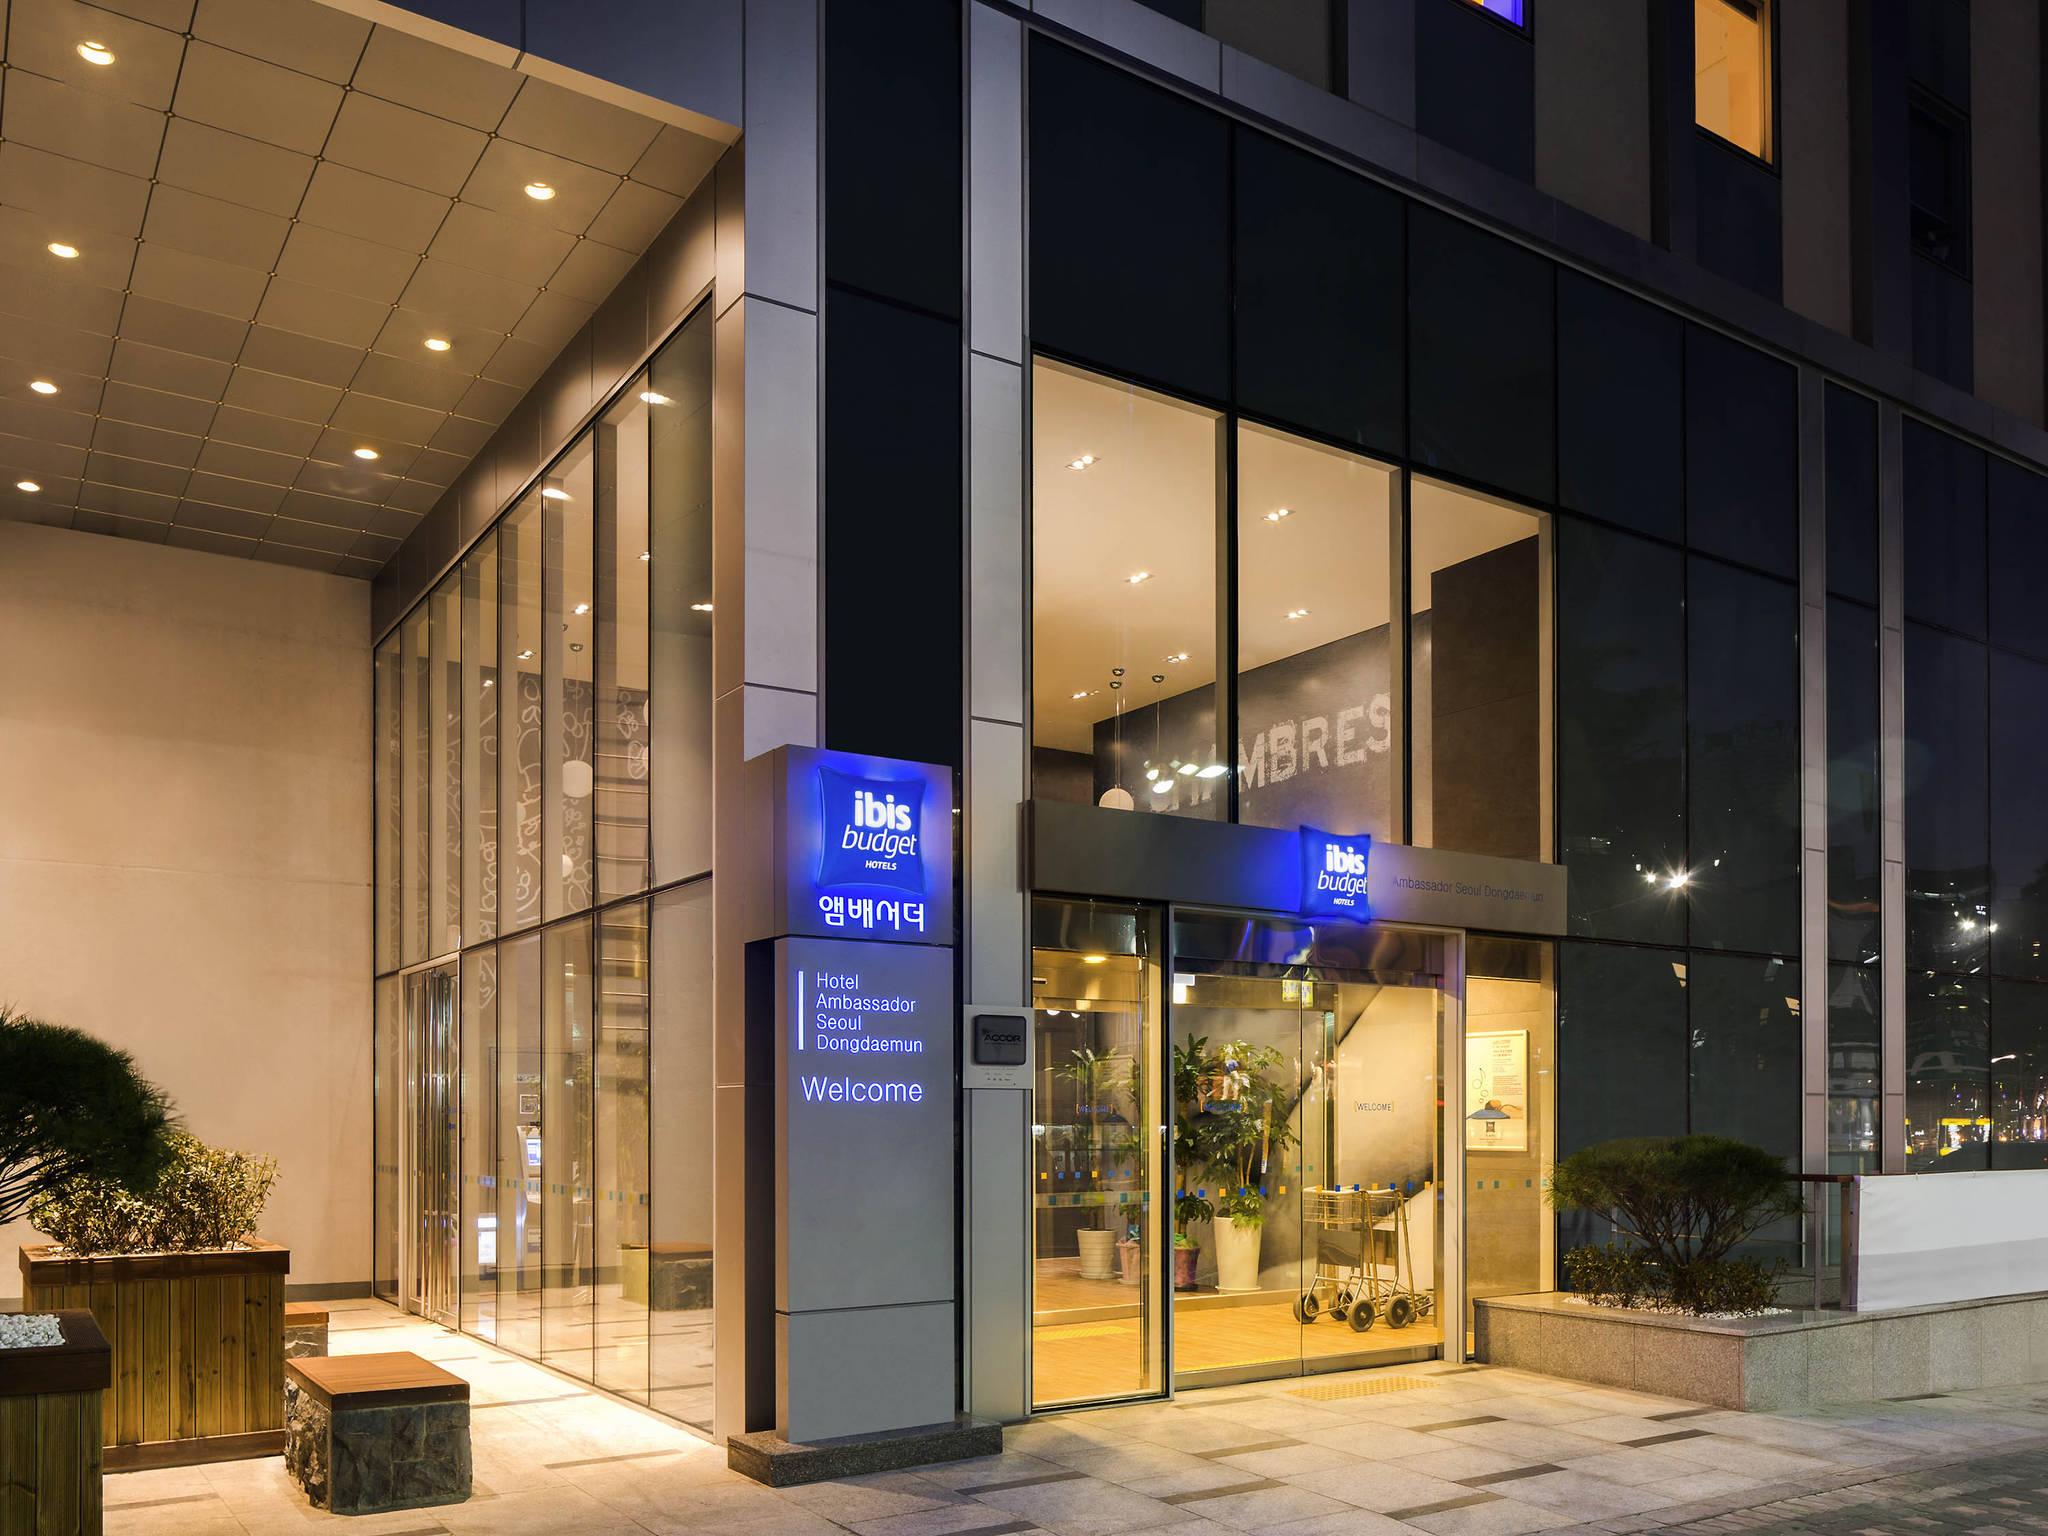 فندق - ibis budget أمباسادور سيول دونج ديمون